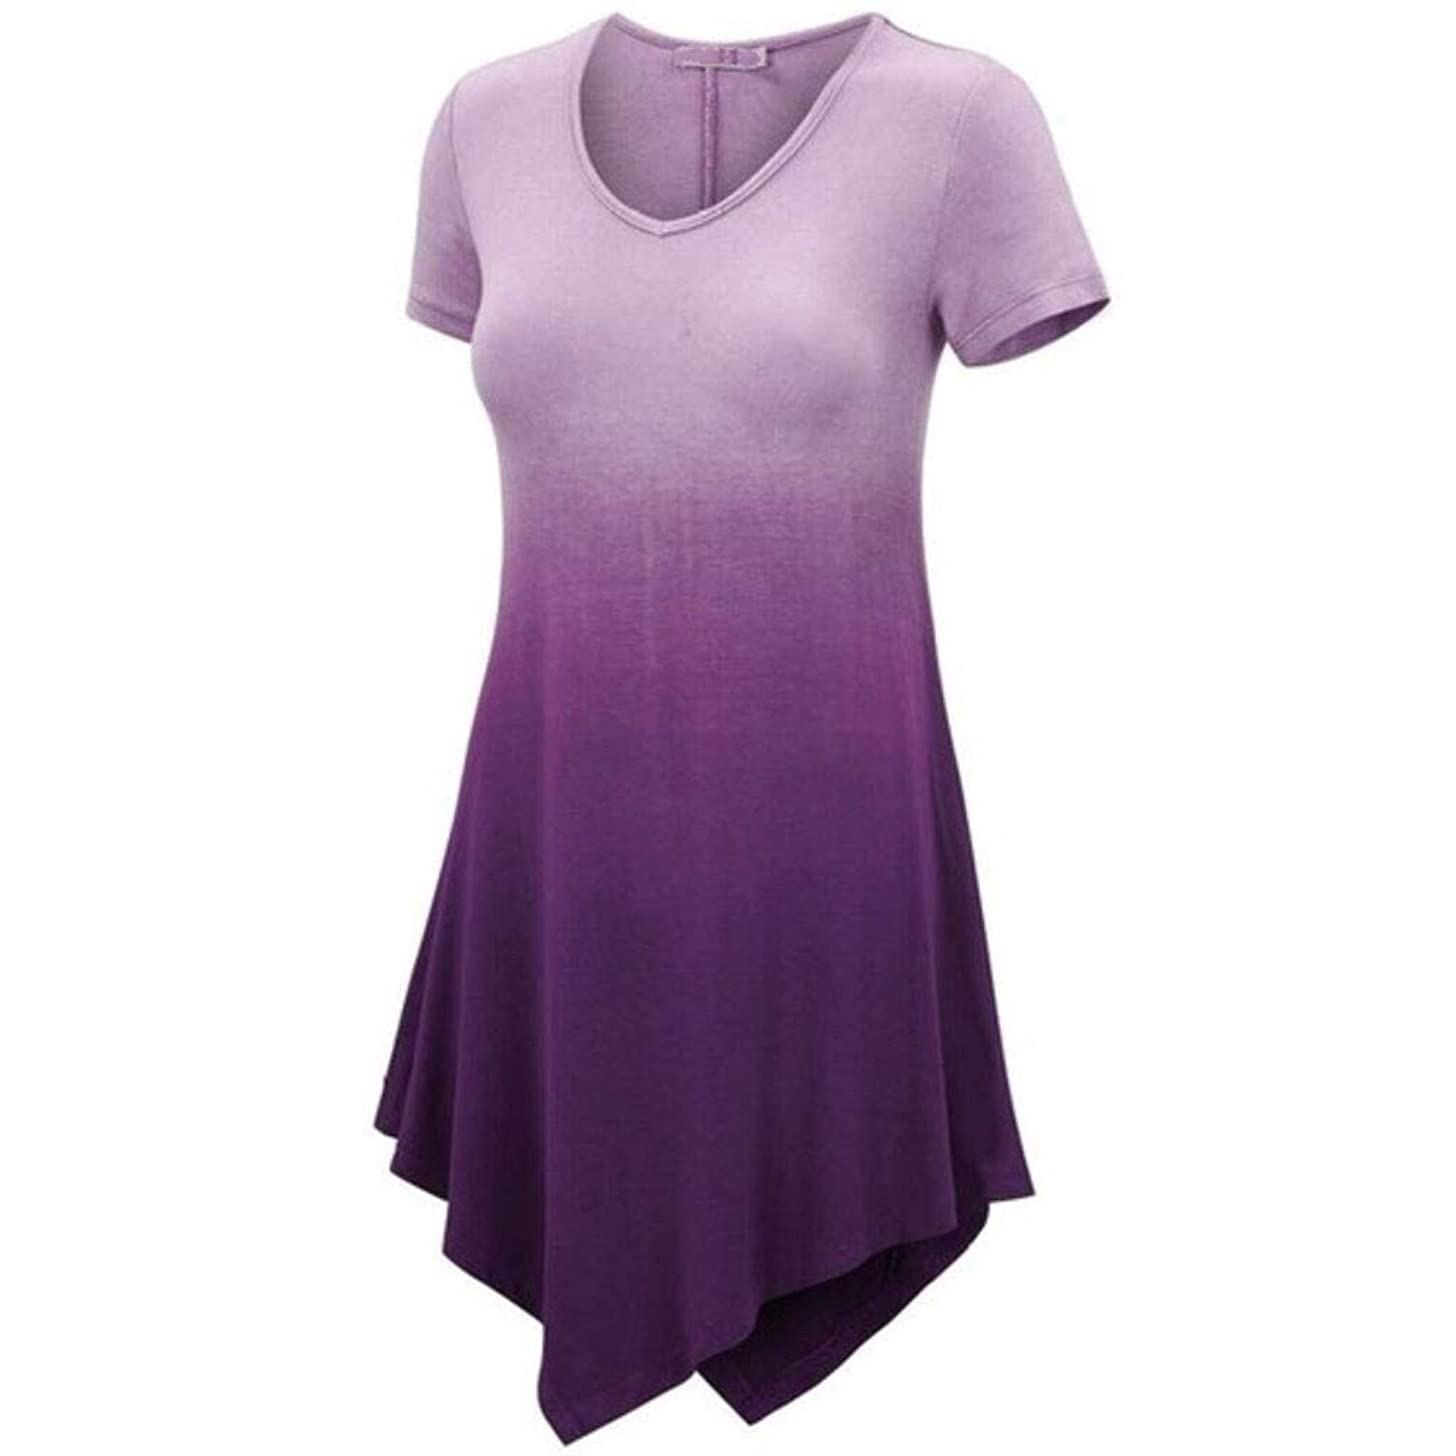 Tantisy ??? Women's Plus Size Irregular Dress Fashion Gradient Short Sleeve Casual Dress